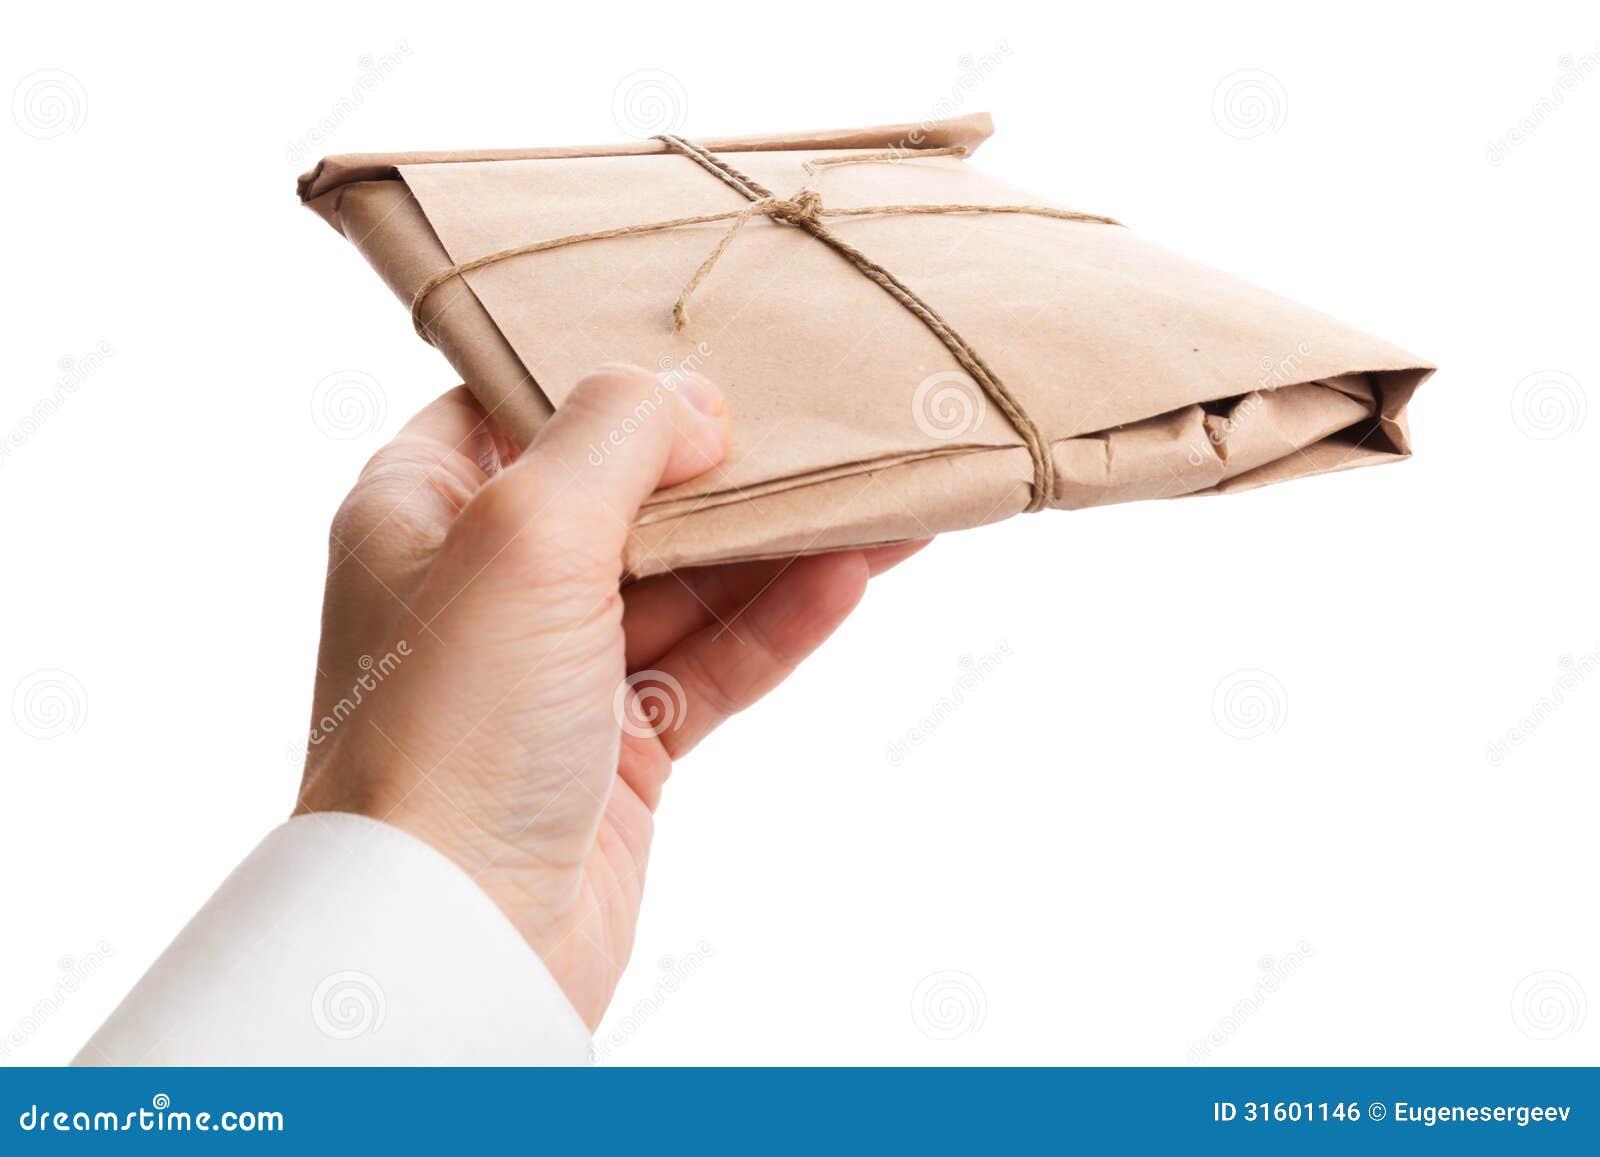 La main masculine livre la pleine enveloppe